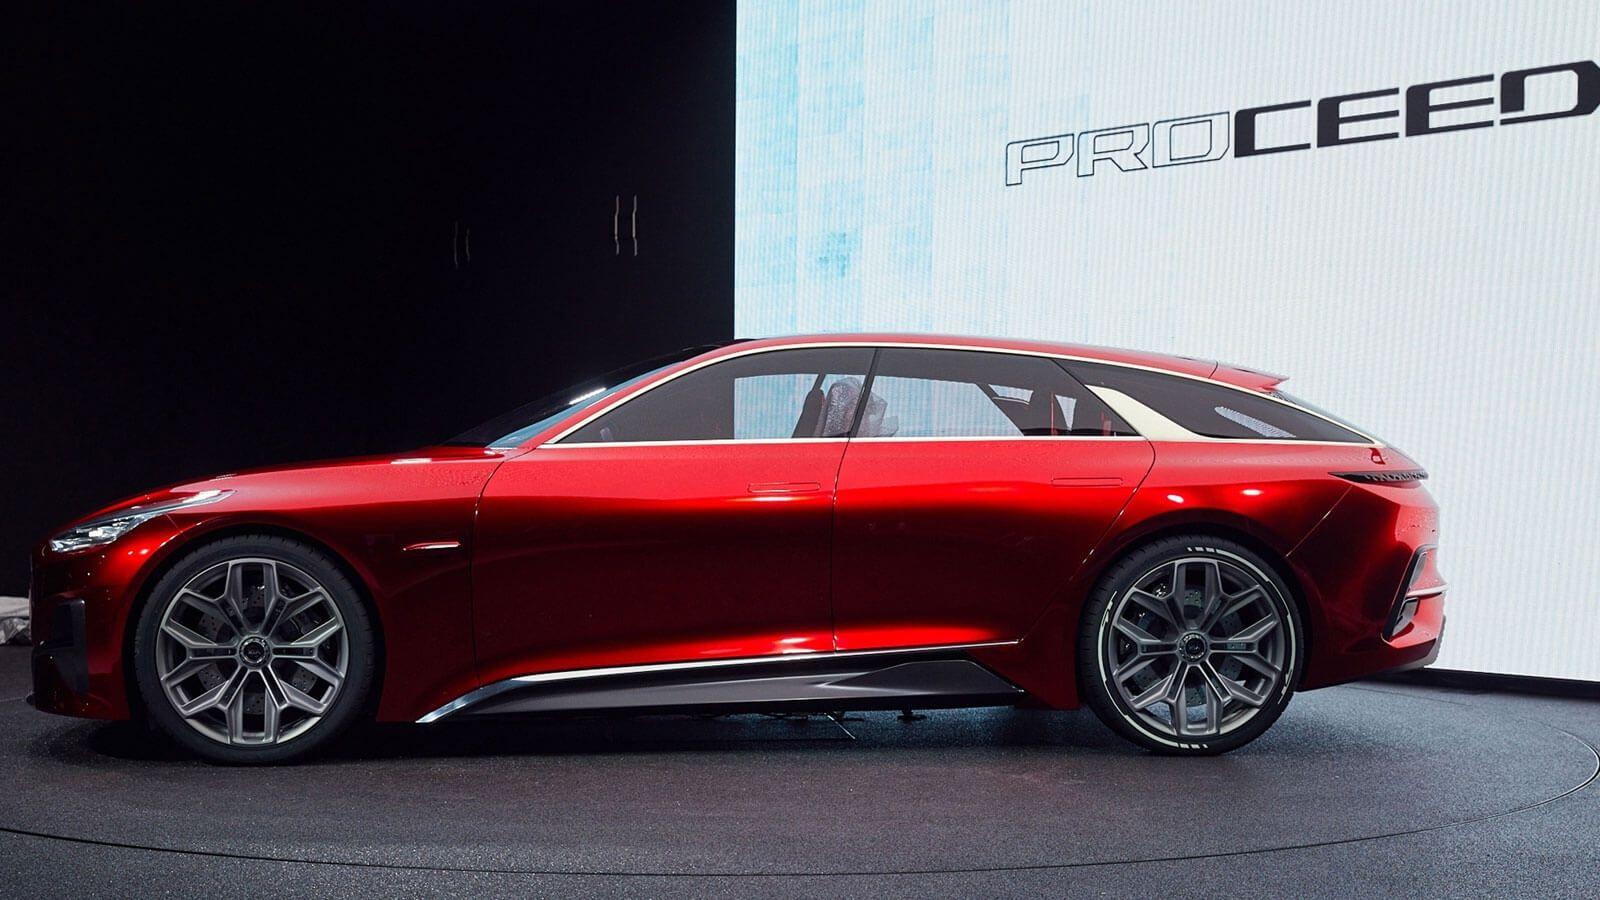 Kia Pro Ceed 2021 Configurations In 2020 Kia Car Review Car